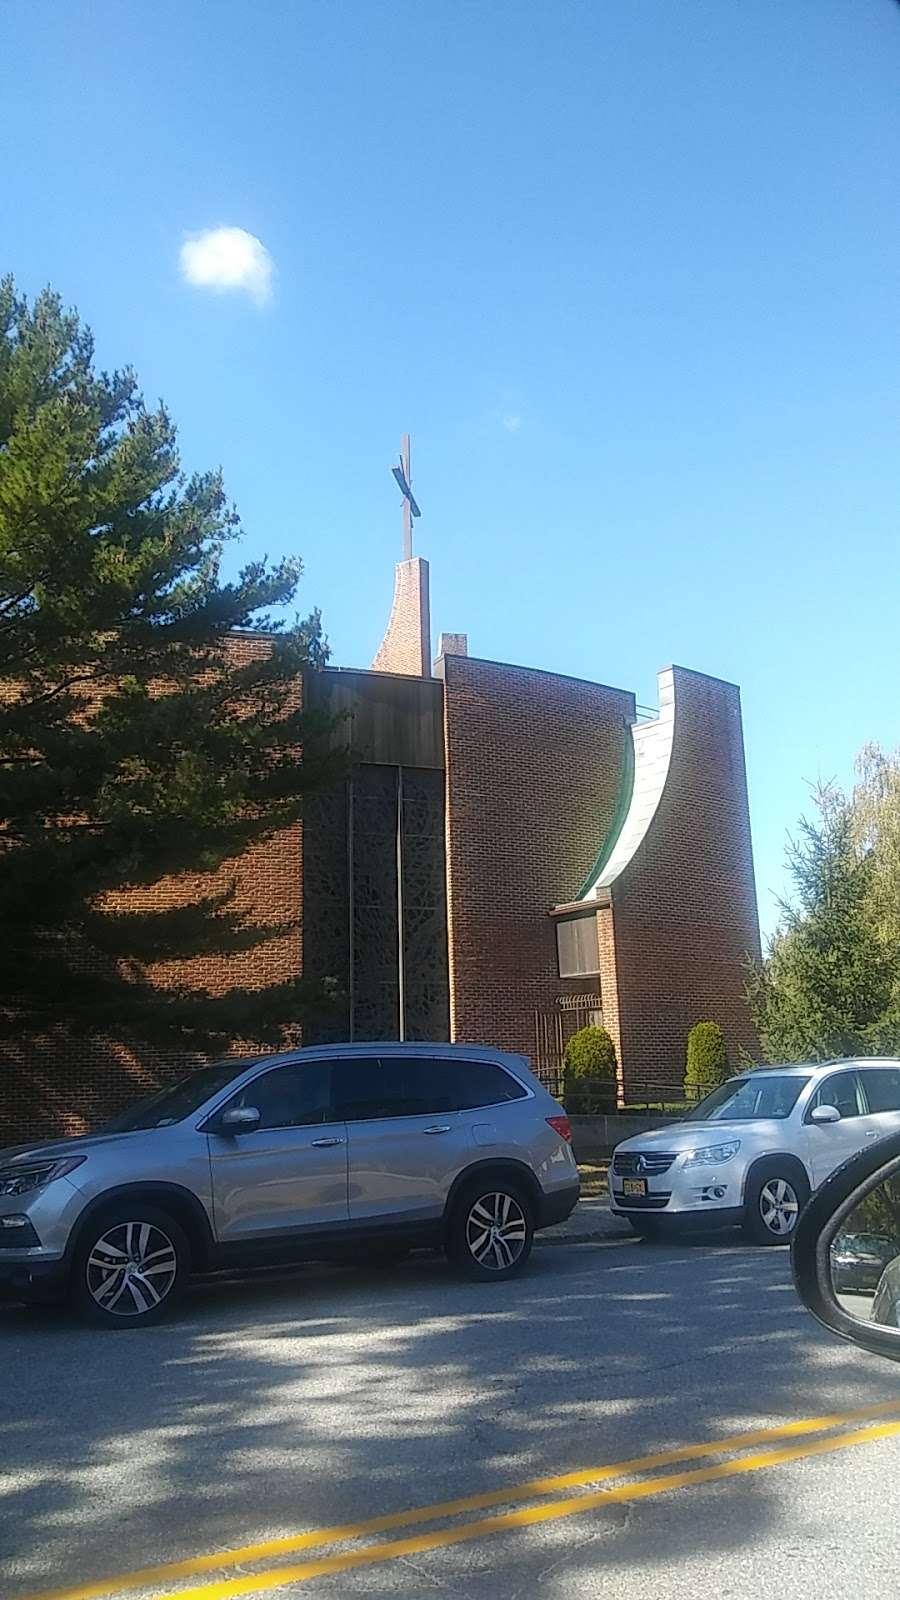 St. Frances de Chantal Church - church  | Photo 1 of 2 | Address: 190 Hollywood Ave, Bronx, NY 10465, USA | Phone: (718) 792-5500